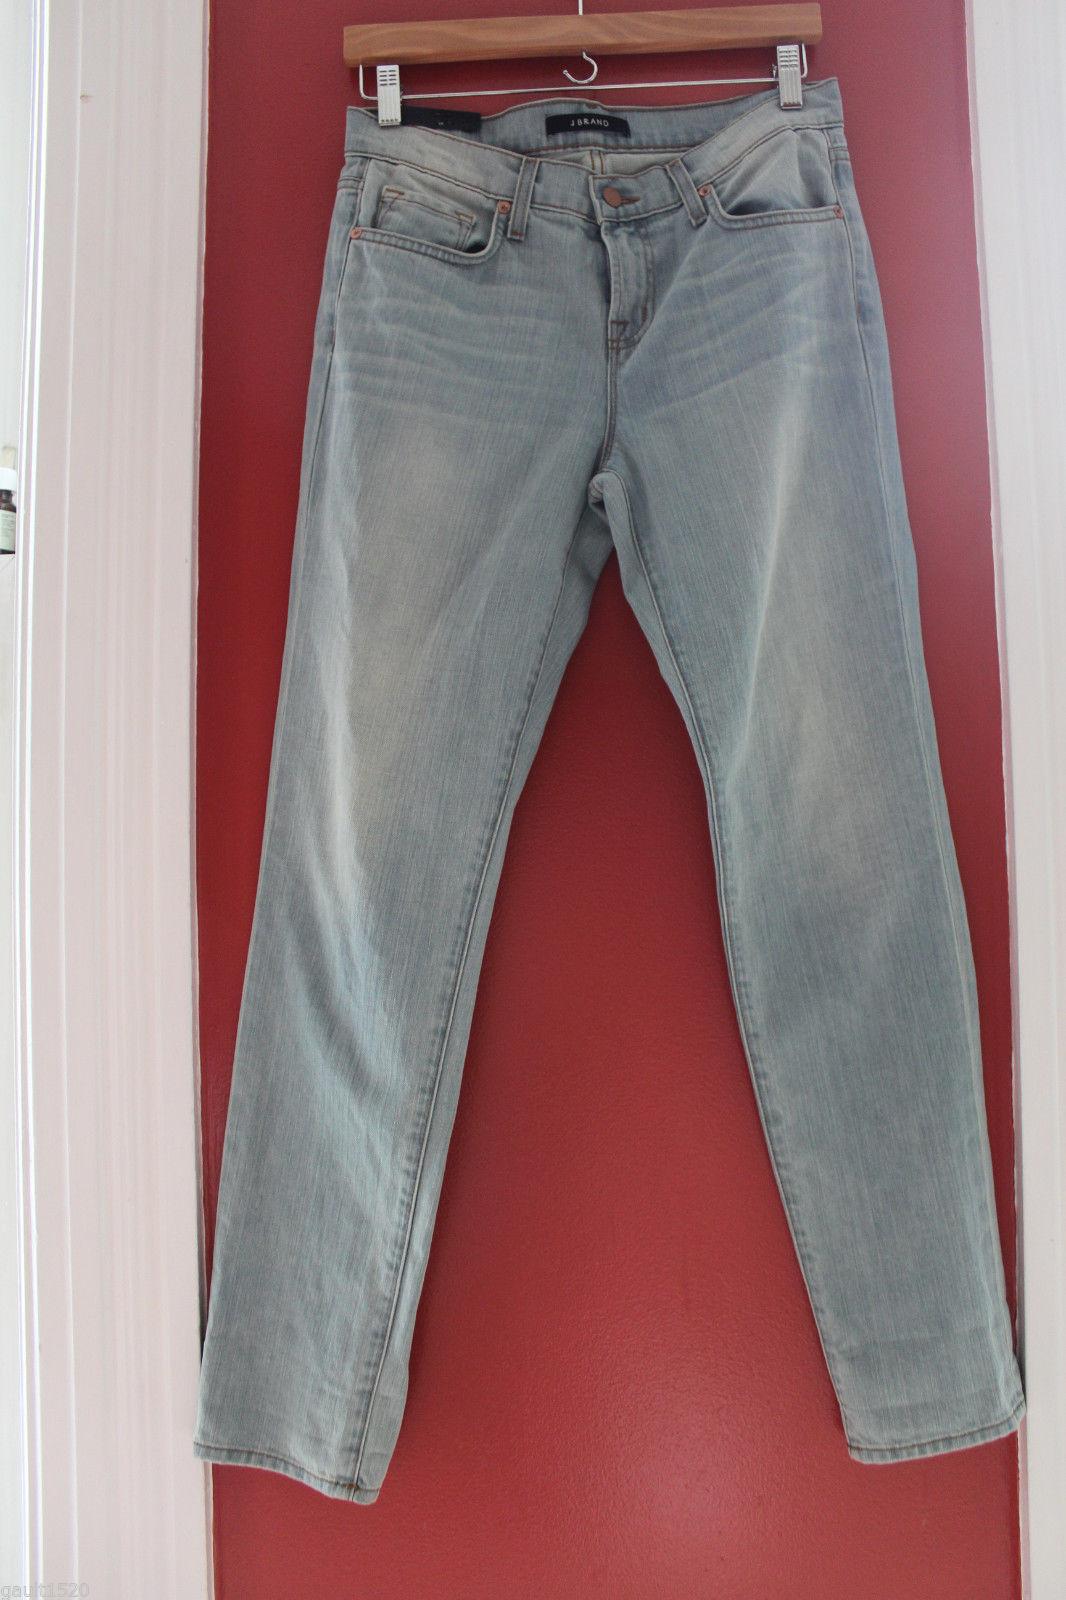 NWT J BRAND Designer Women's Aidan Slouchy Boy Jeans Denim Pants 26 2 $359 image 5